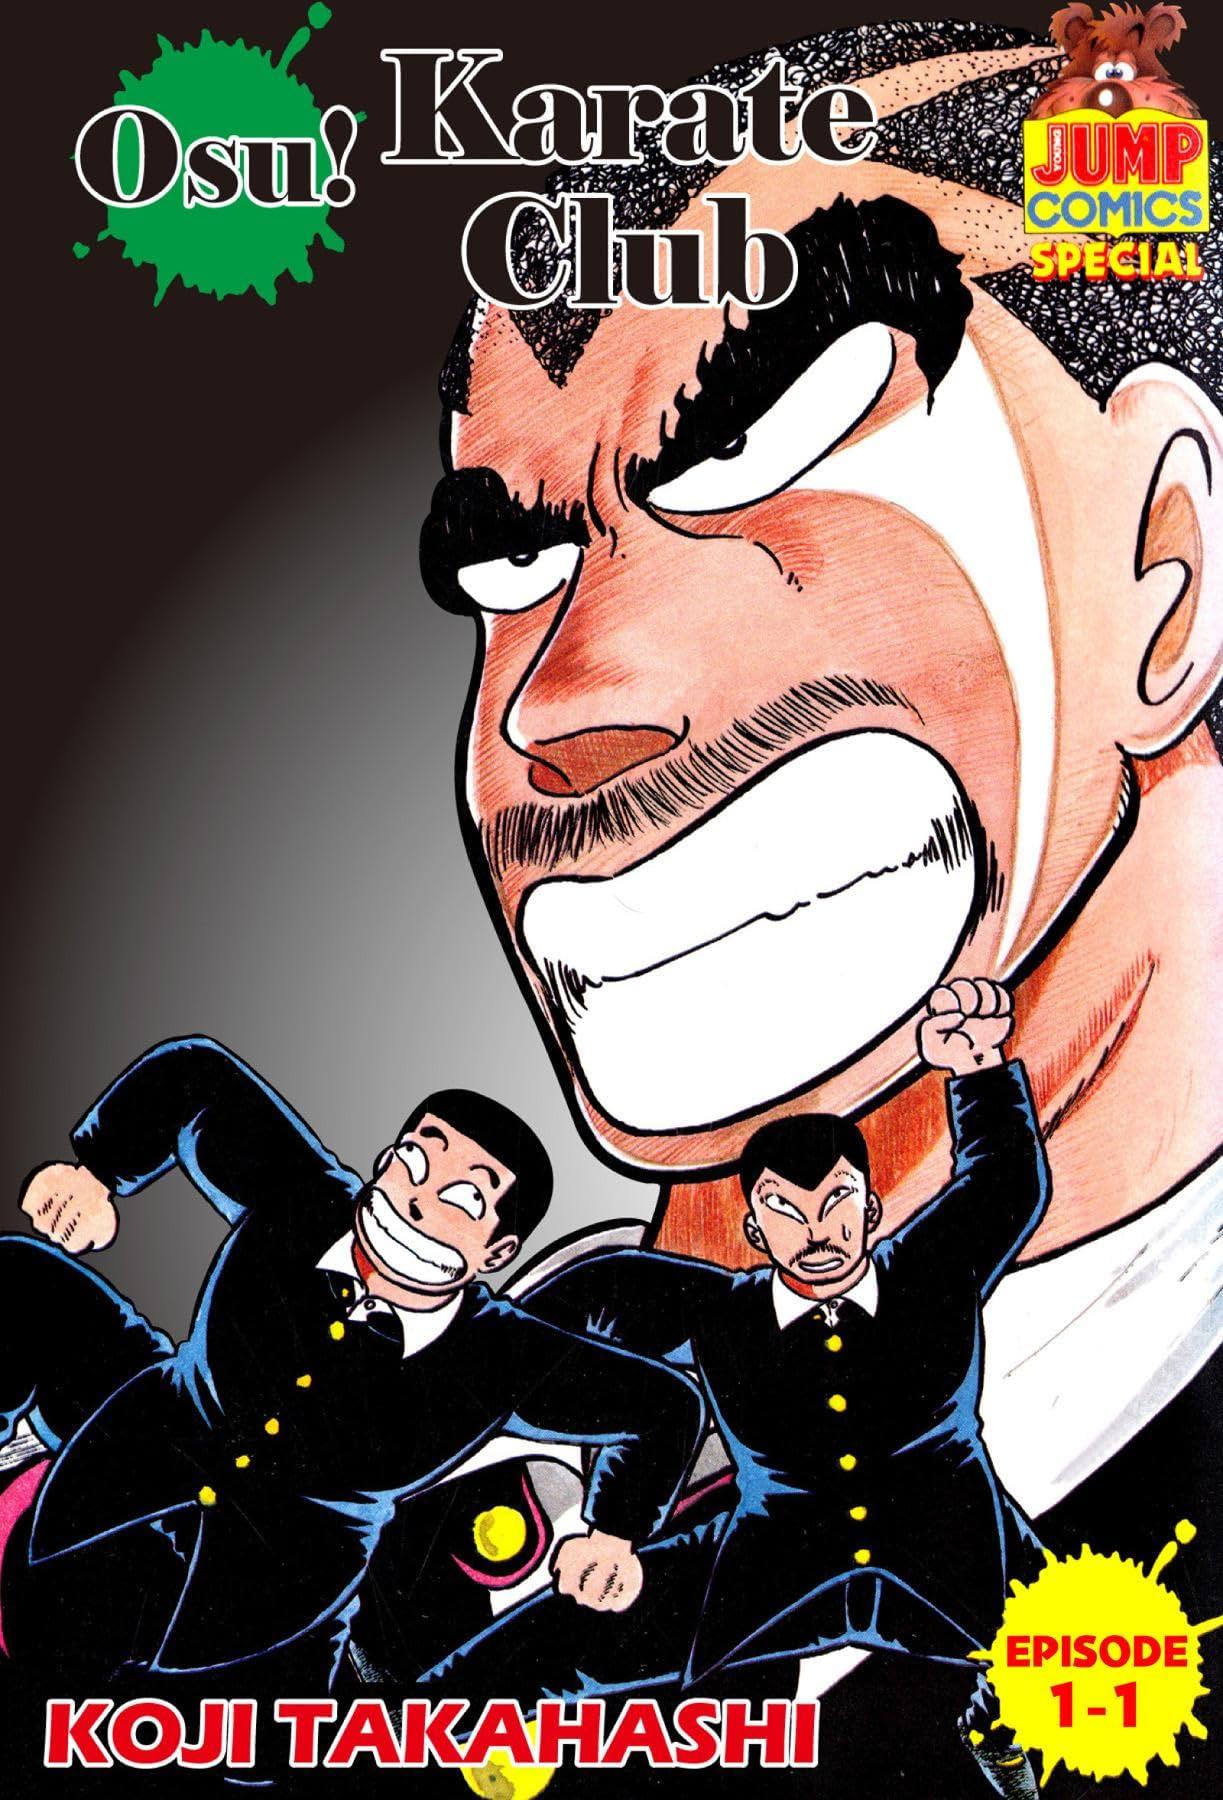 Osu! Karate Club #1